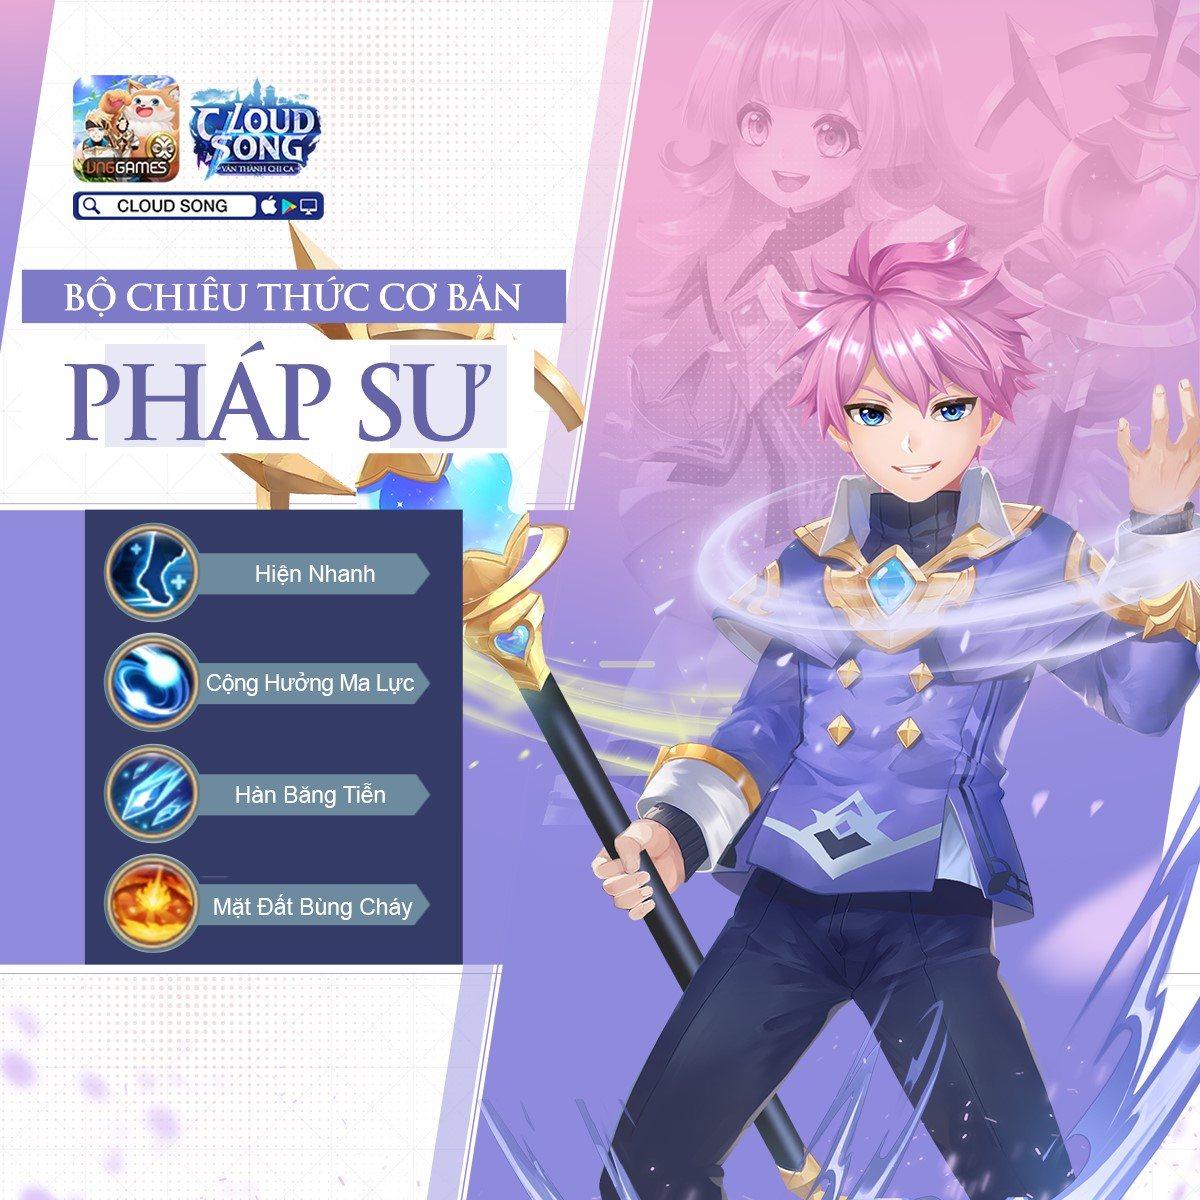 Cloud Song: Điểm danh 5 loại nghề nghiệp trong game